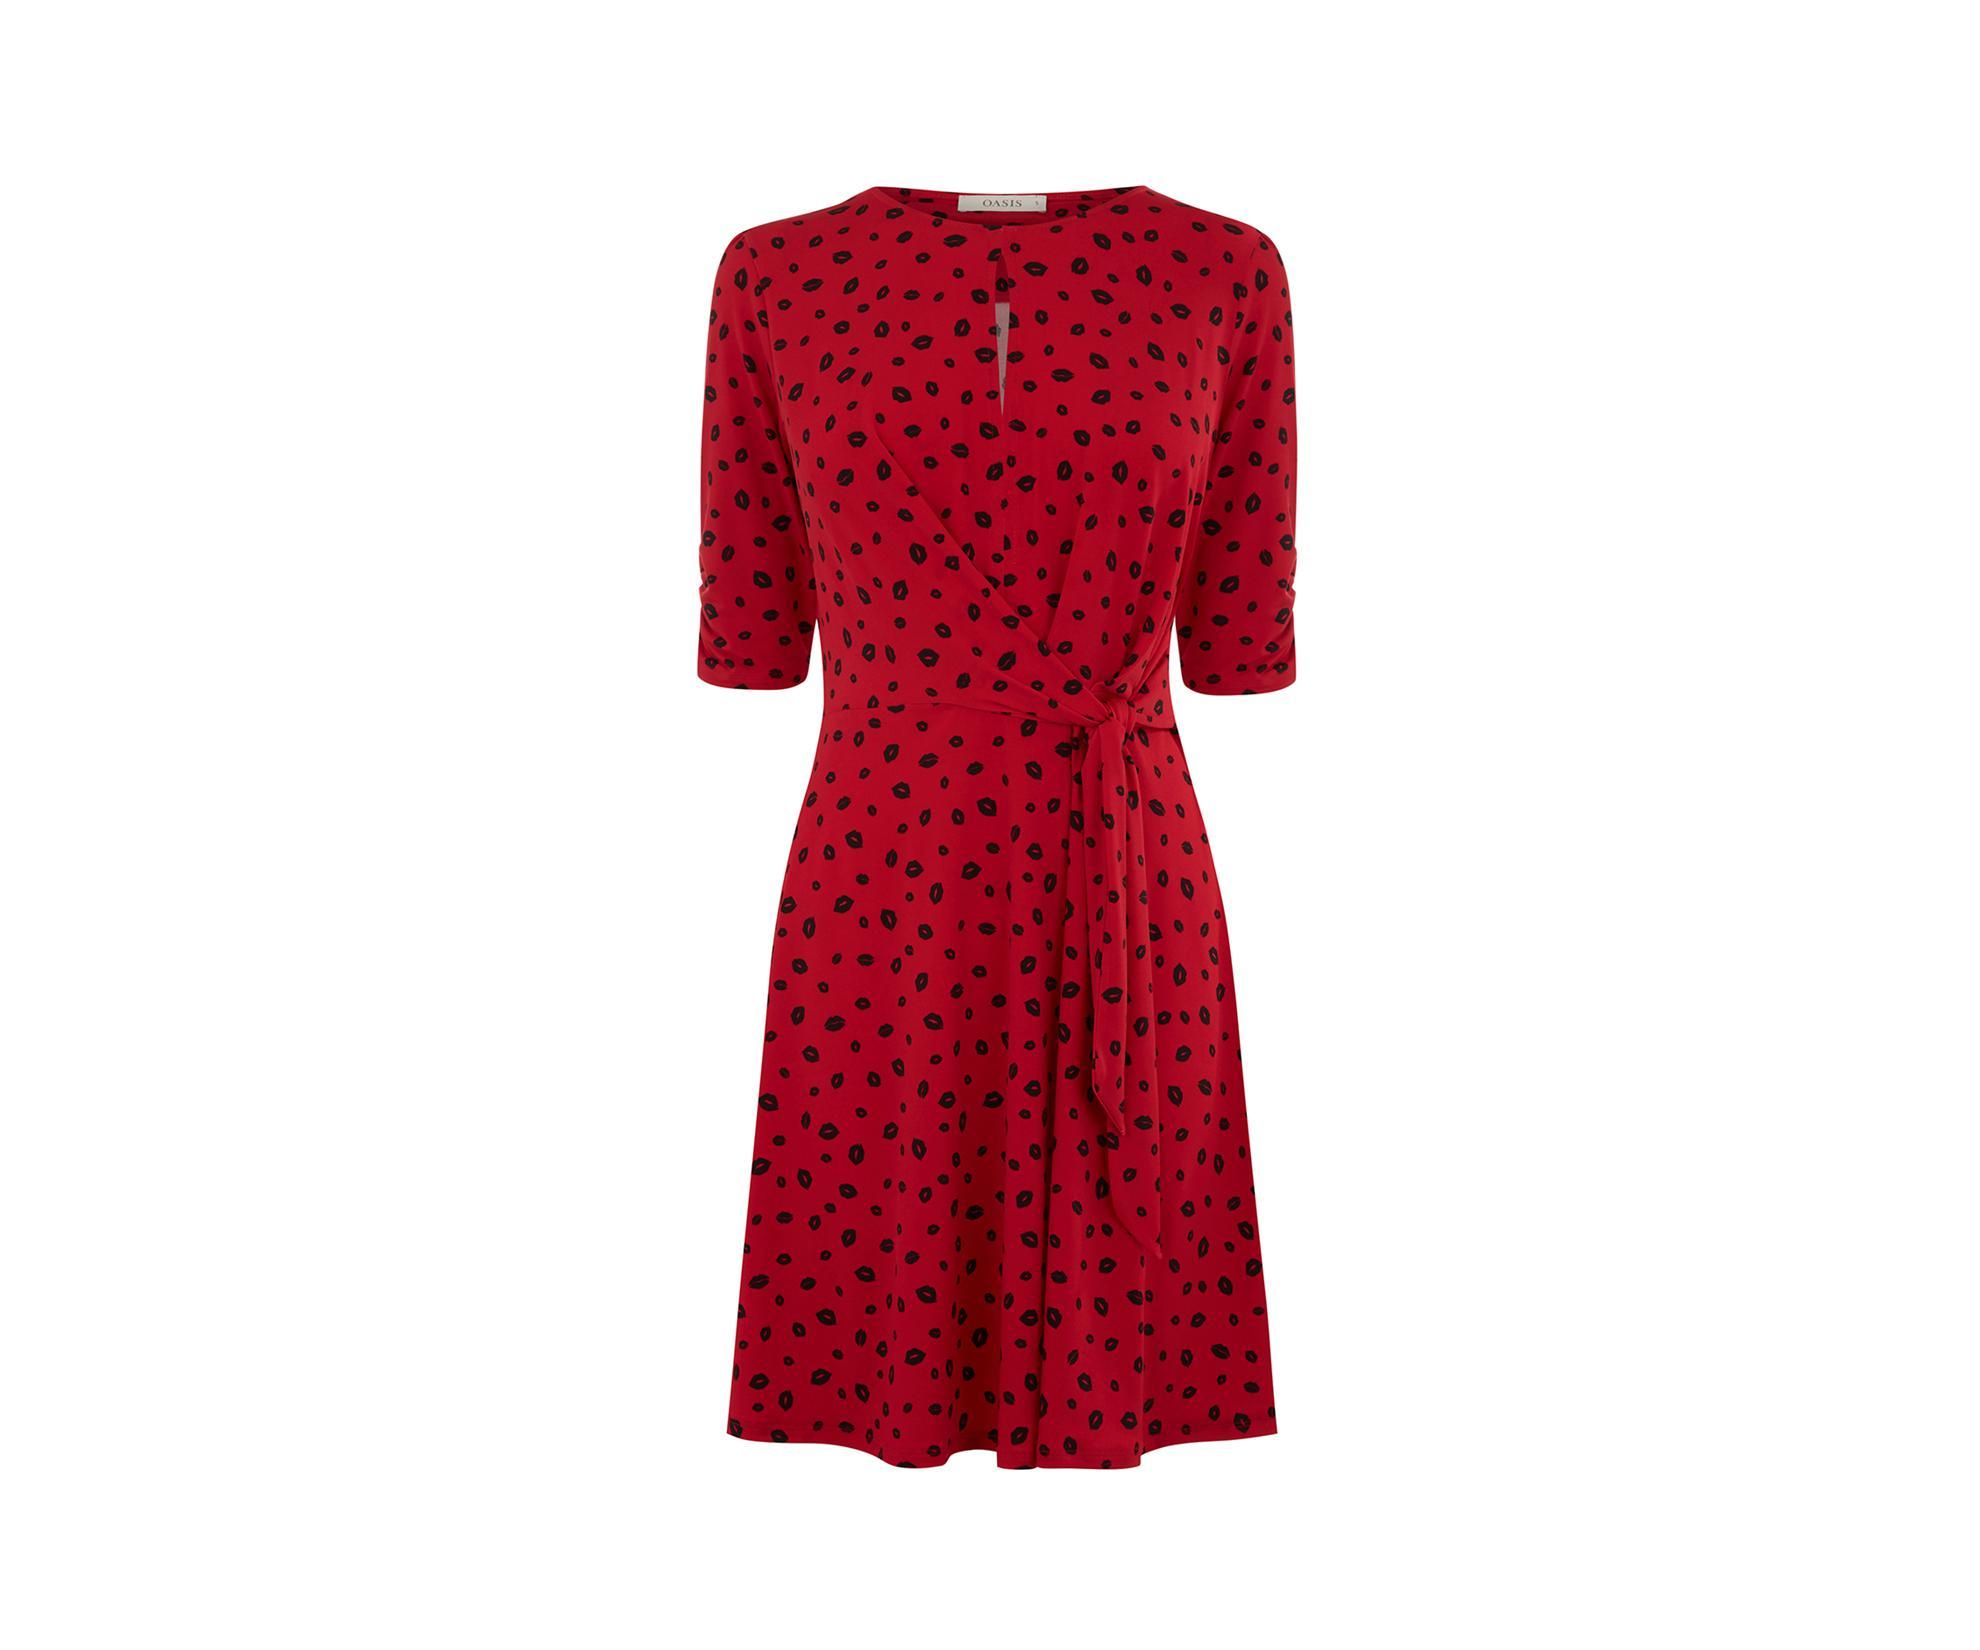 5de9f5ebbd6 ... Lip Print Ruffle Dress - Lyst. View fullscreen